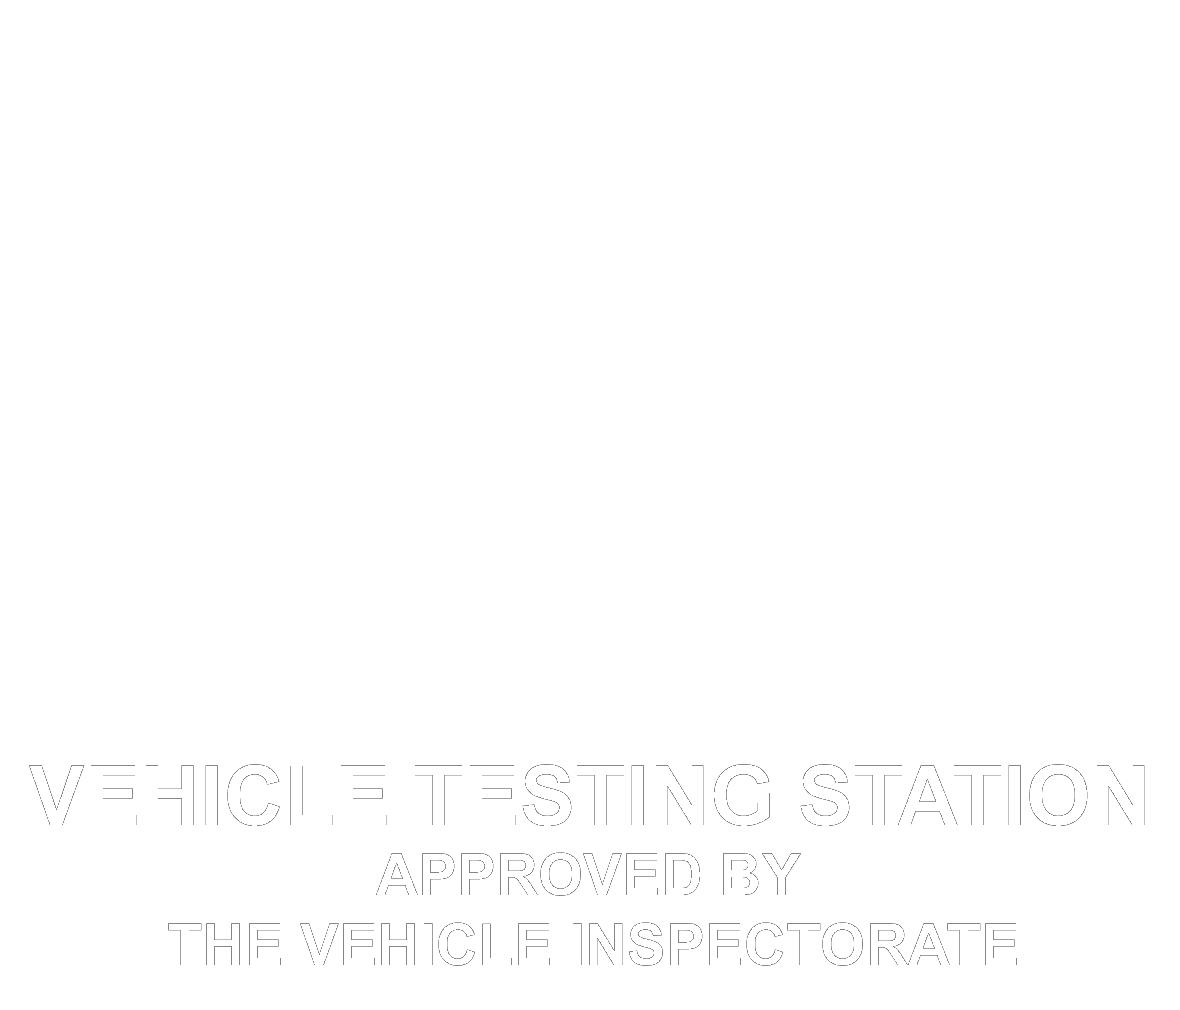 ACE MOT Station Garage, Mechanic, Cathays Cardiff - Home